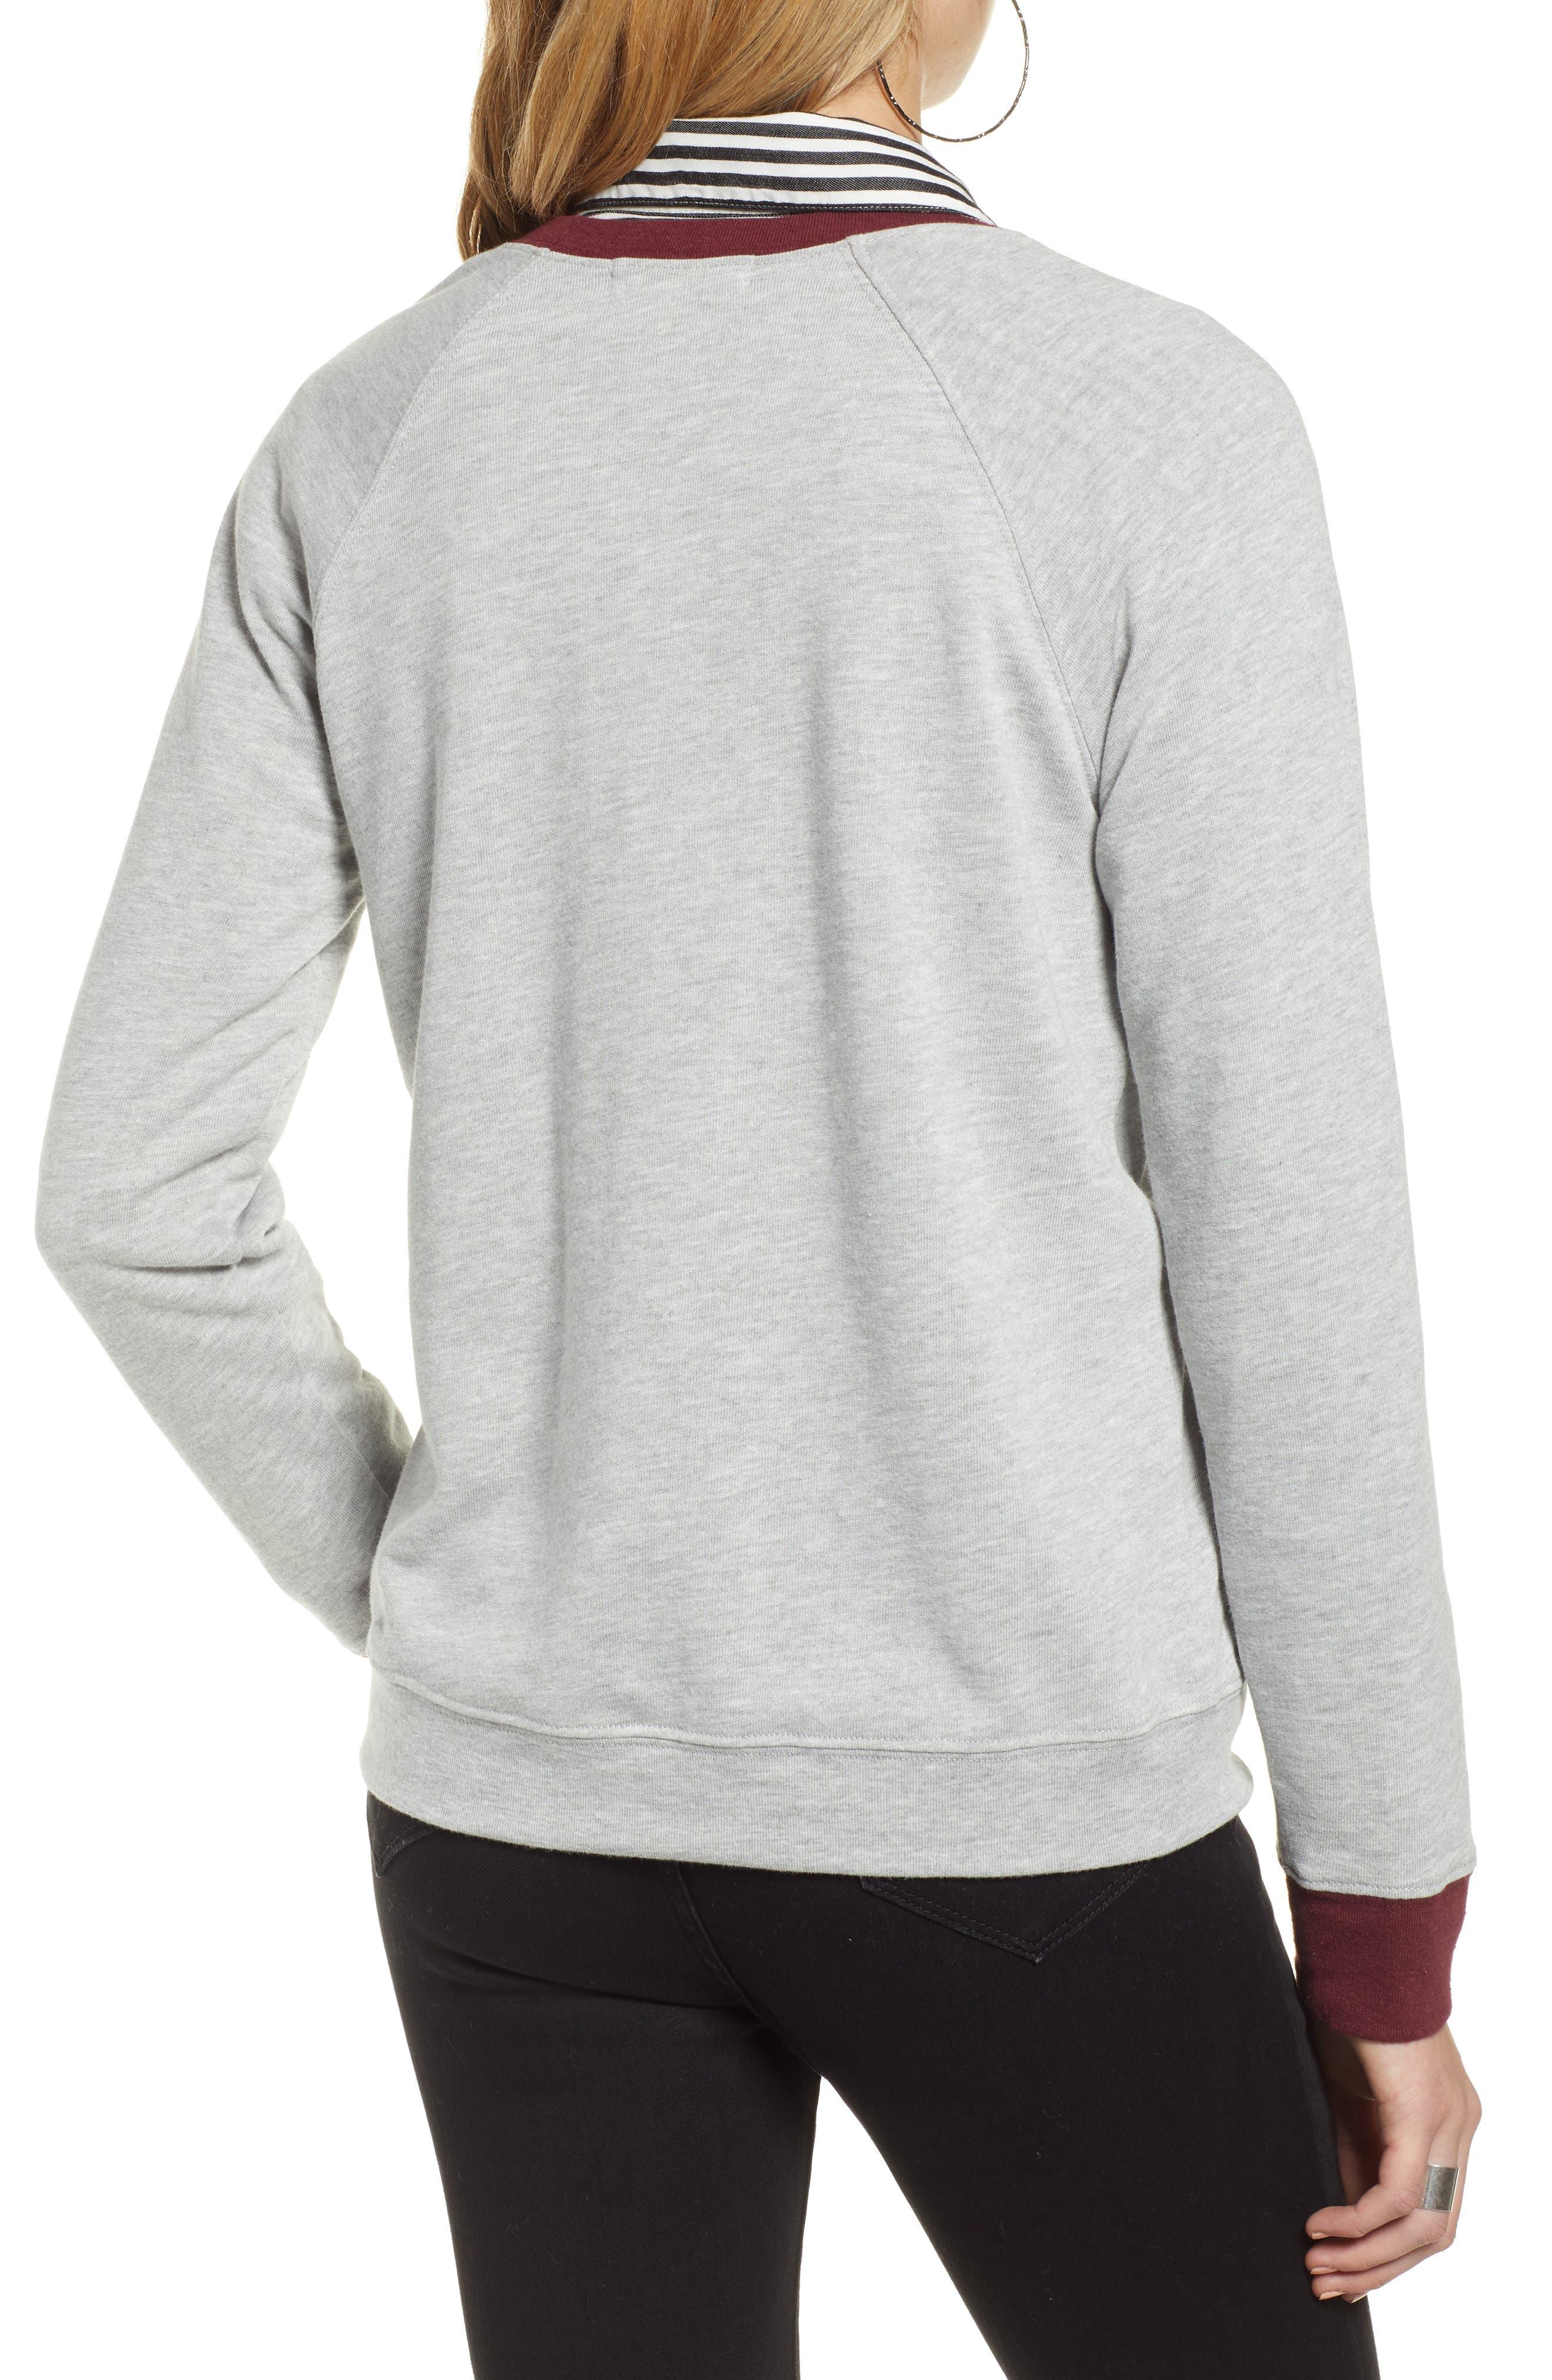 TREASURE & BOND, Crewneck Sweatshirt, Alternate thumbnail 2, color, GREY HEATHER- RED TANNIN COMBO